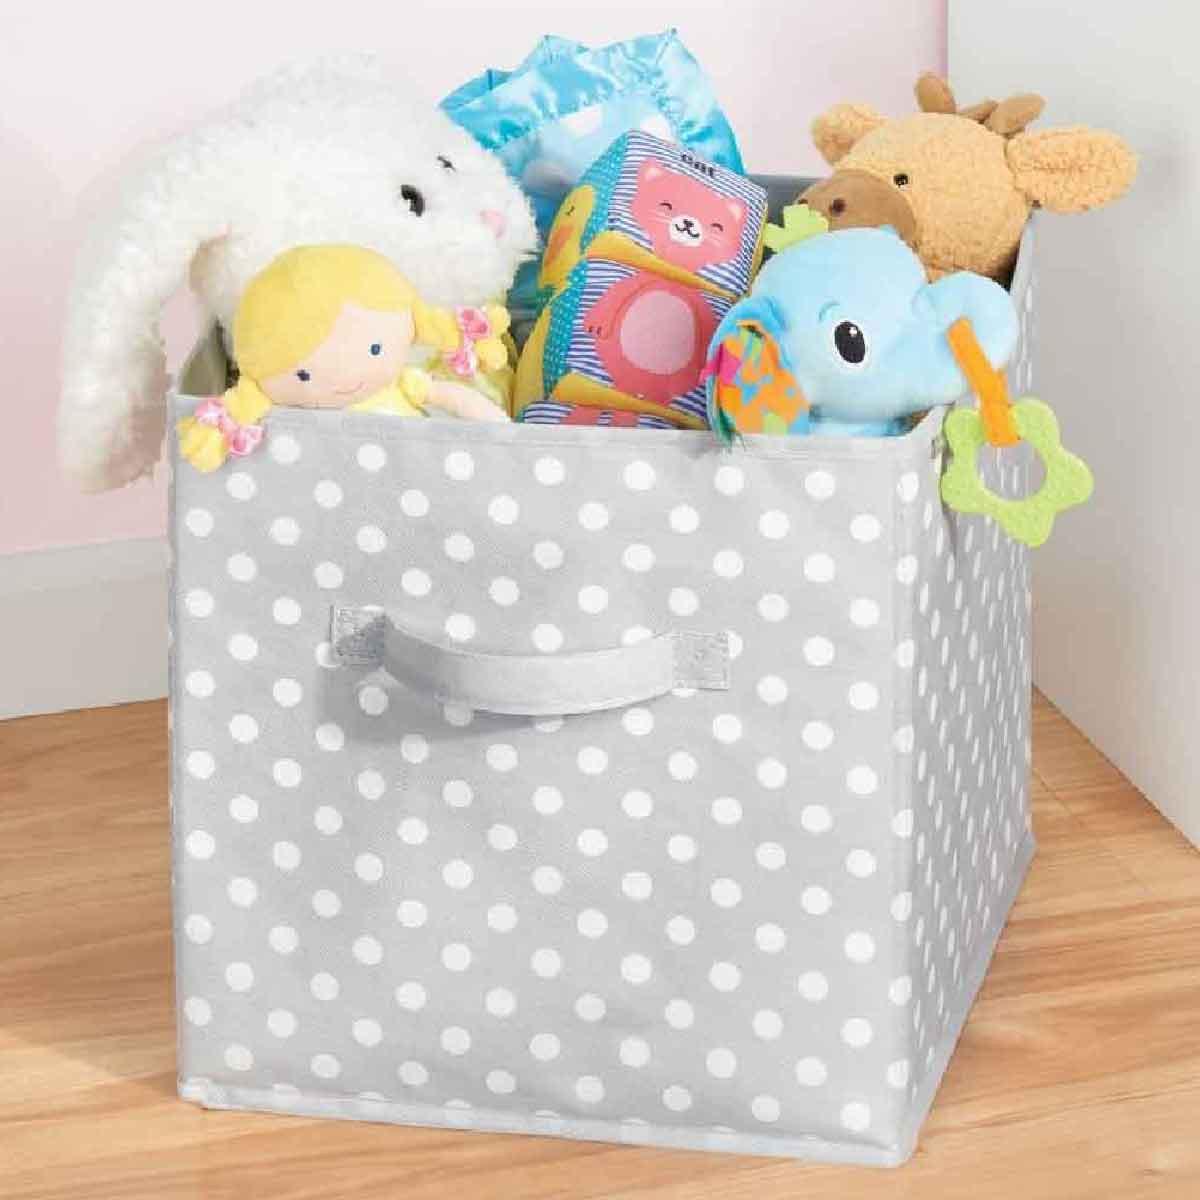 Boite de rangement cube fashion designs - Cube rangement tissu ...